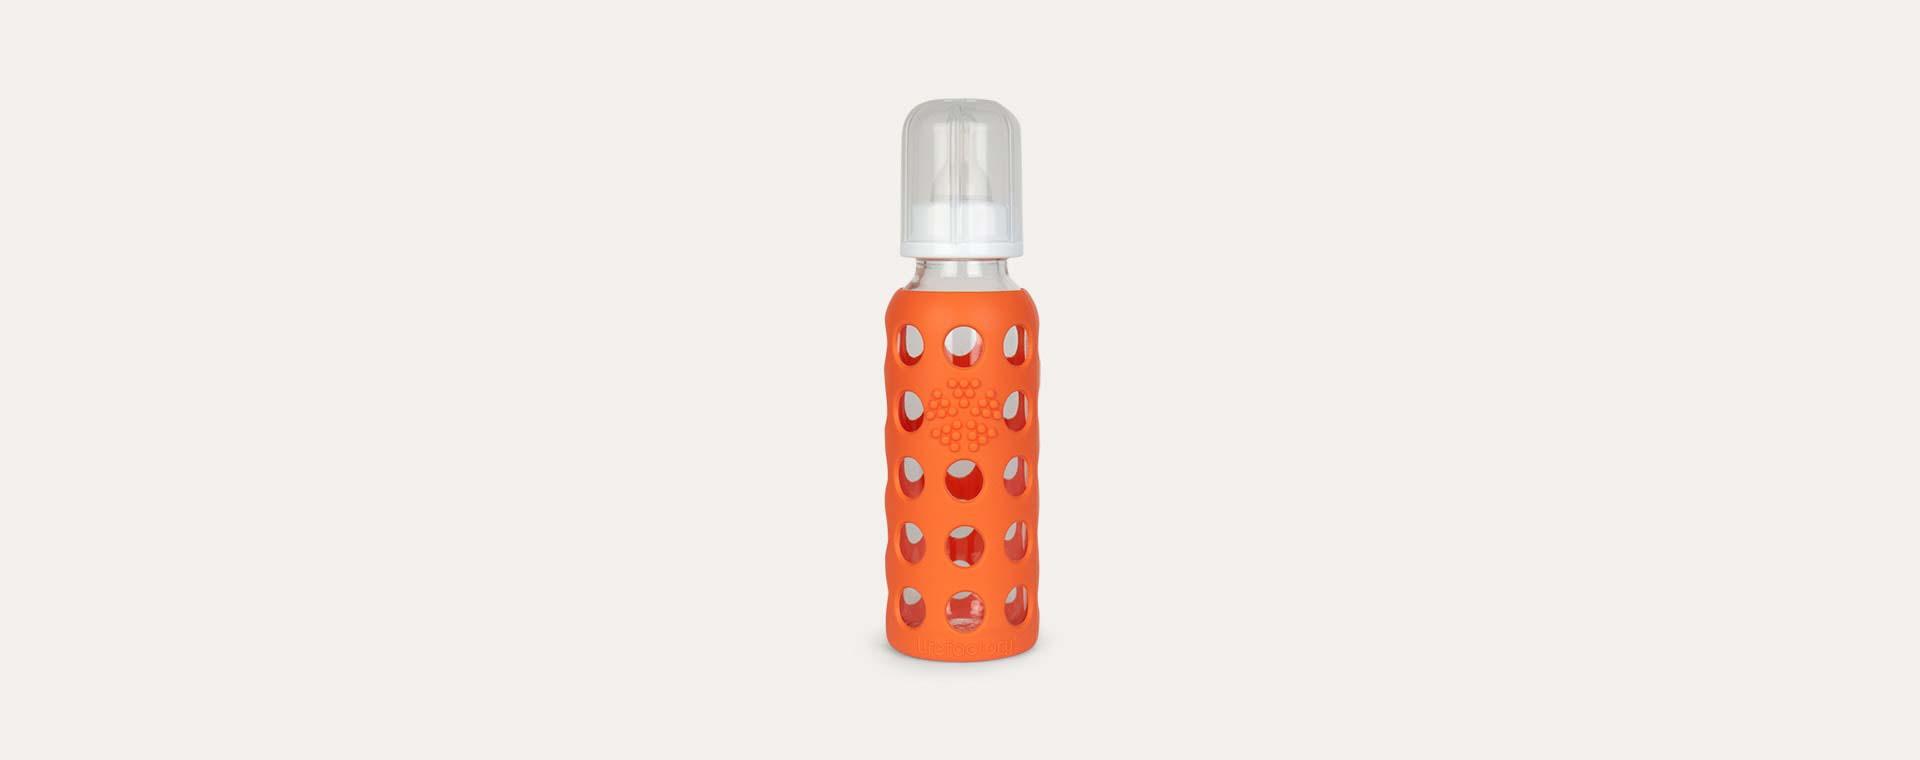 Papaya Lifefactory 9oz Glass Baby Bottle